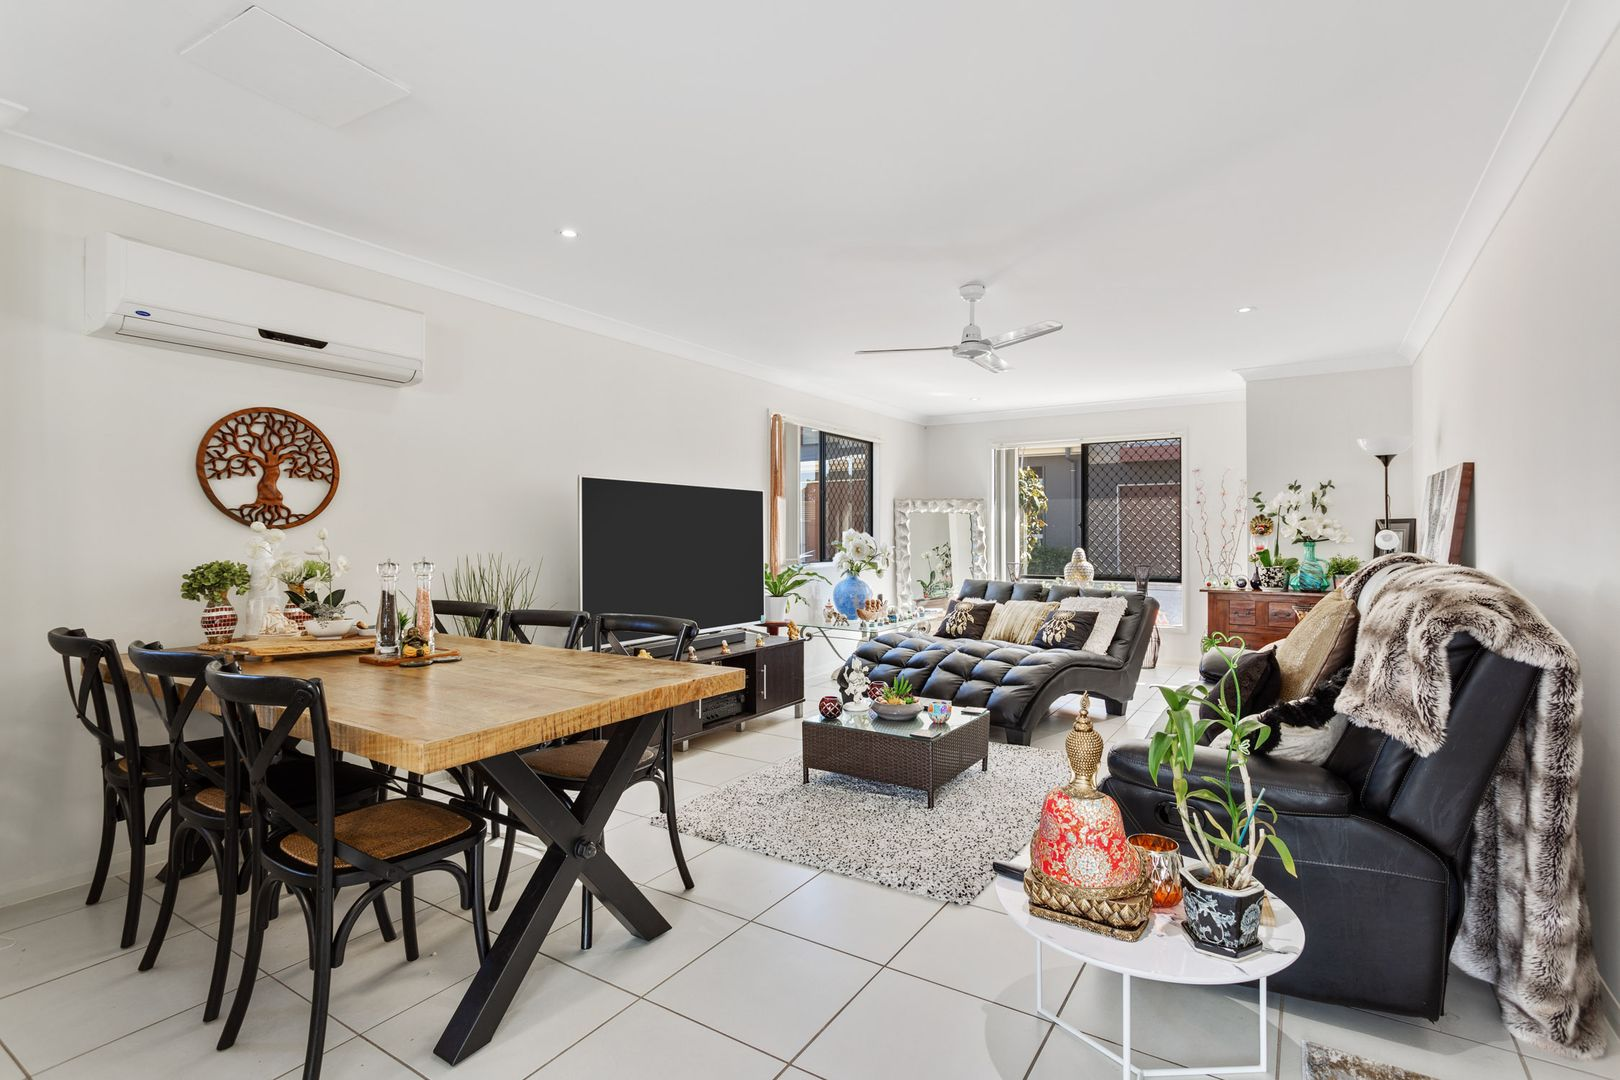 14/24 Avondale St, Newtown QLD 4350, Image 2